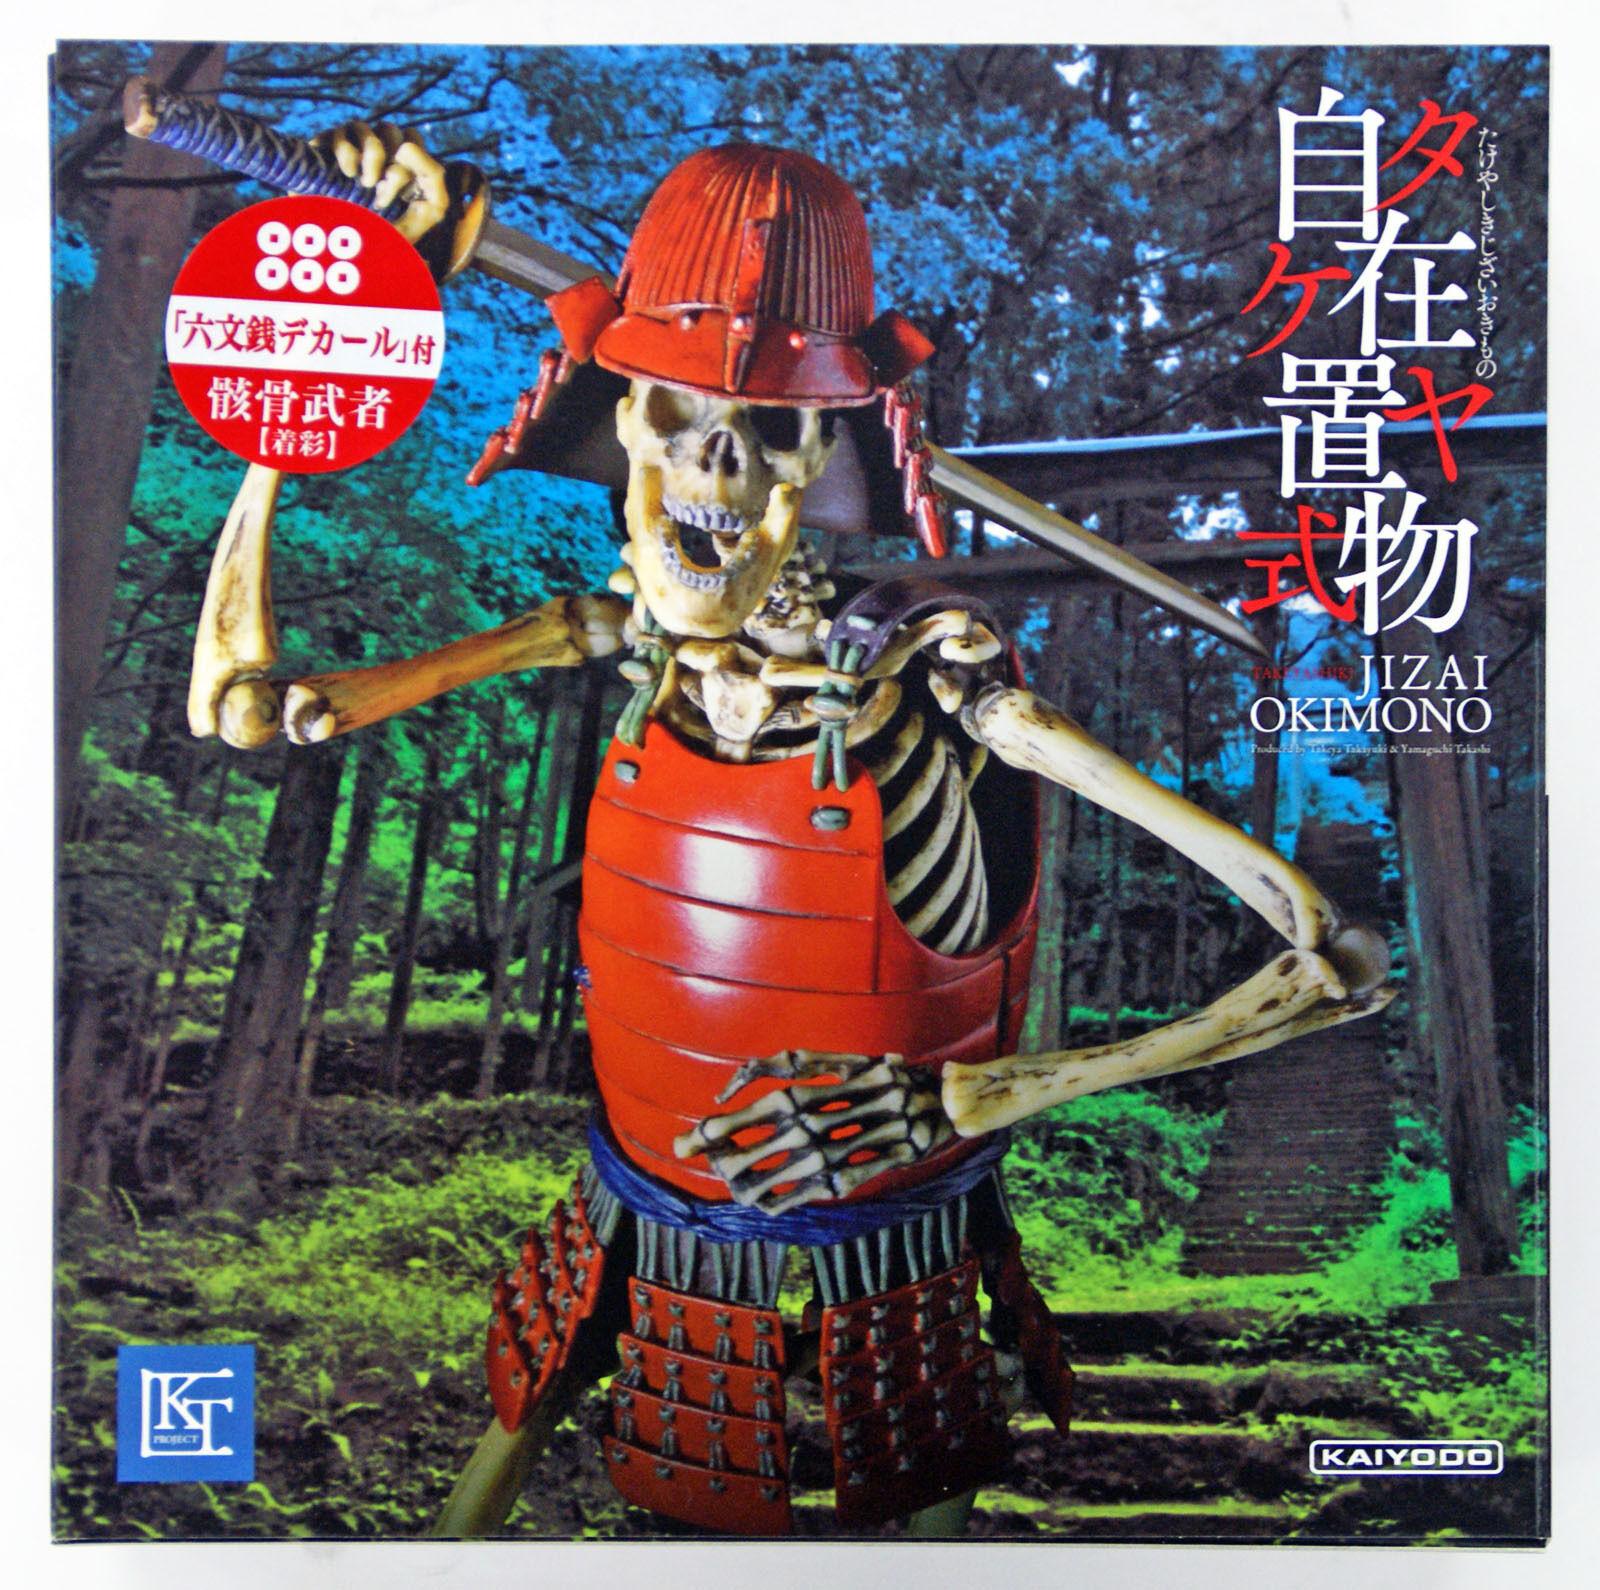 Kaiyodo takeyashiki jizai Okimono KT-010 Esqueleto Guerrero Figura 4537807120144